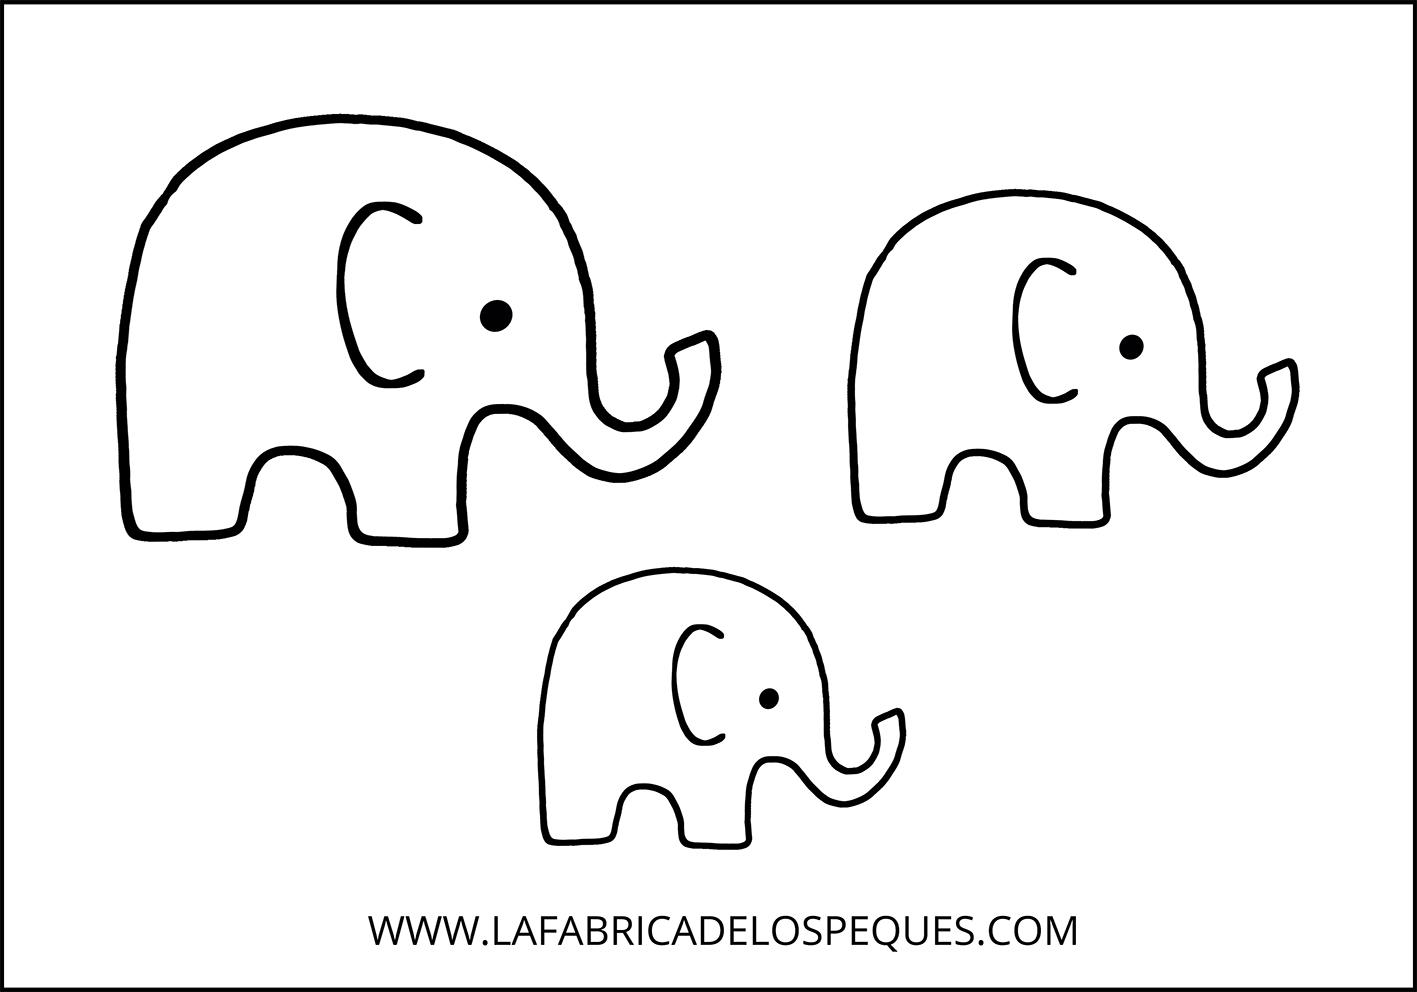 Dibujo Elefante Para Colorear E Imprimir: Elefante Animales Para Recortar